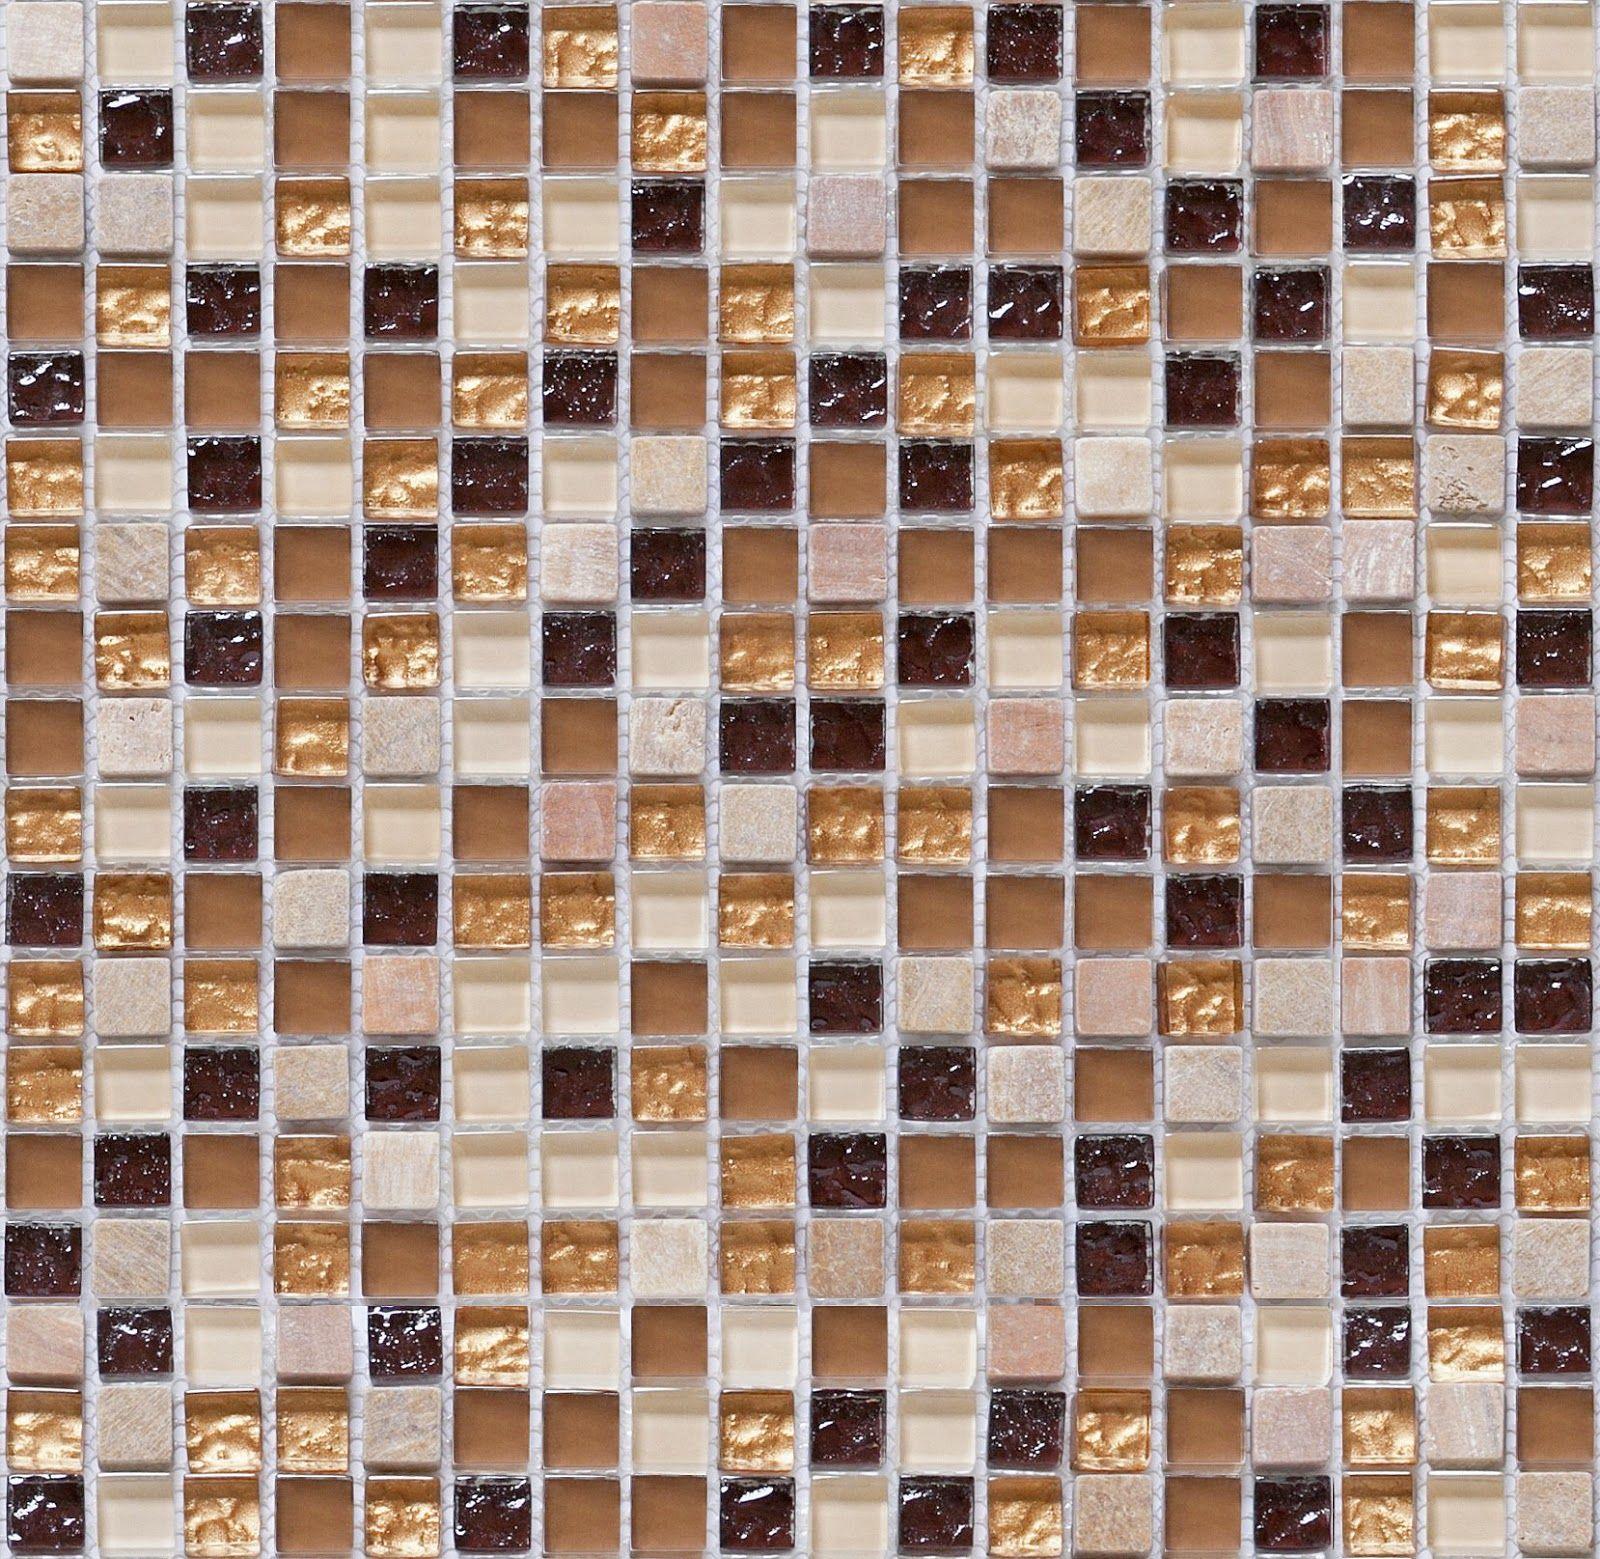 Seamless Mosaic Tiles Texture + (Maps) | texturise ...